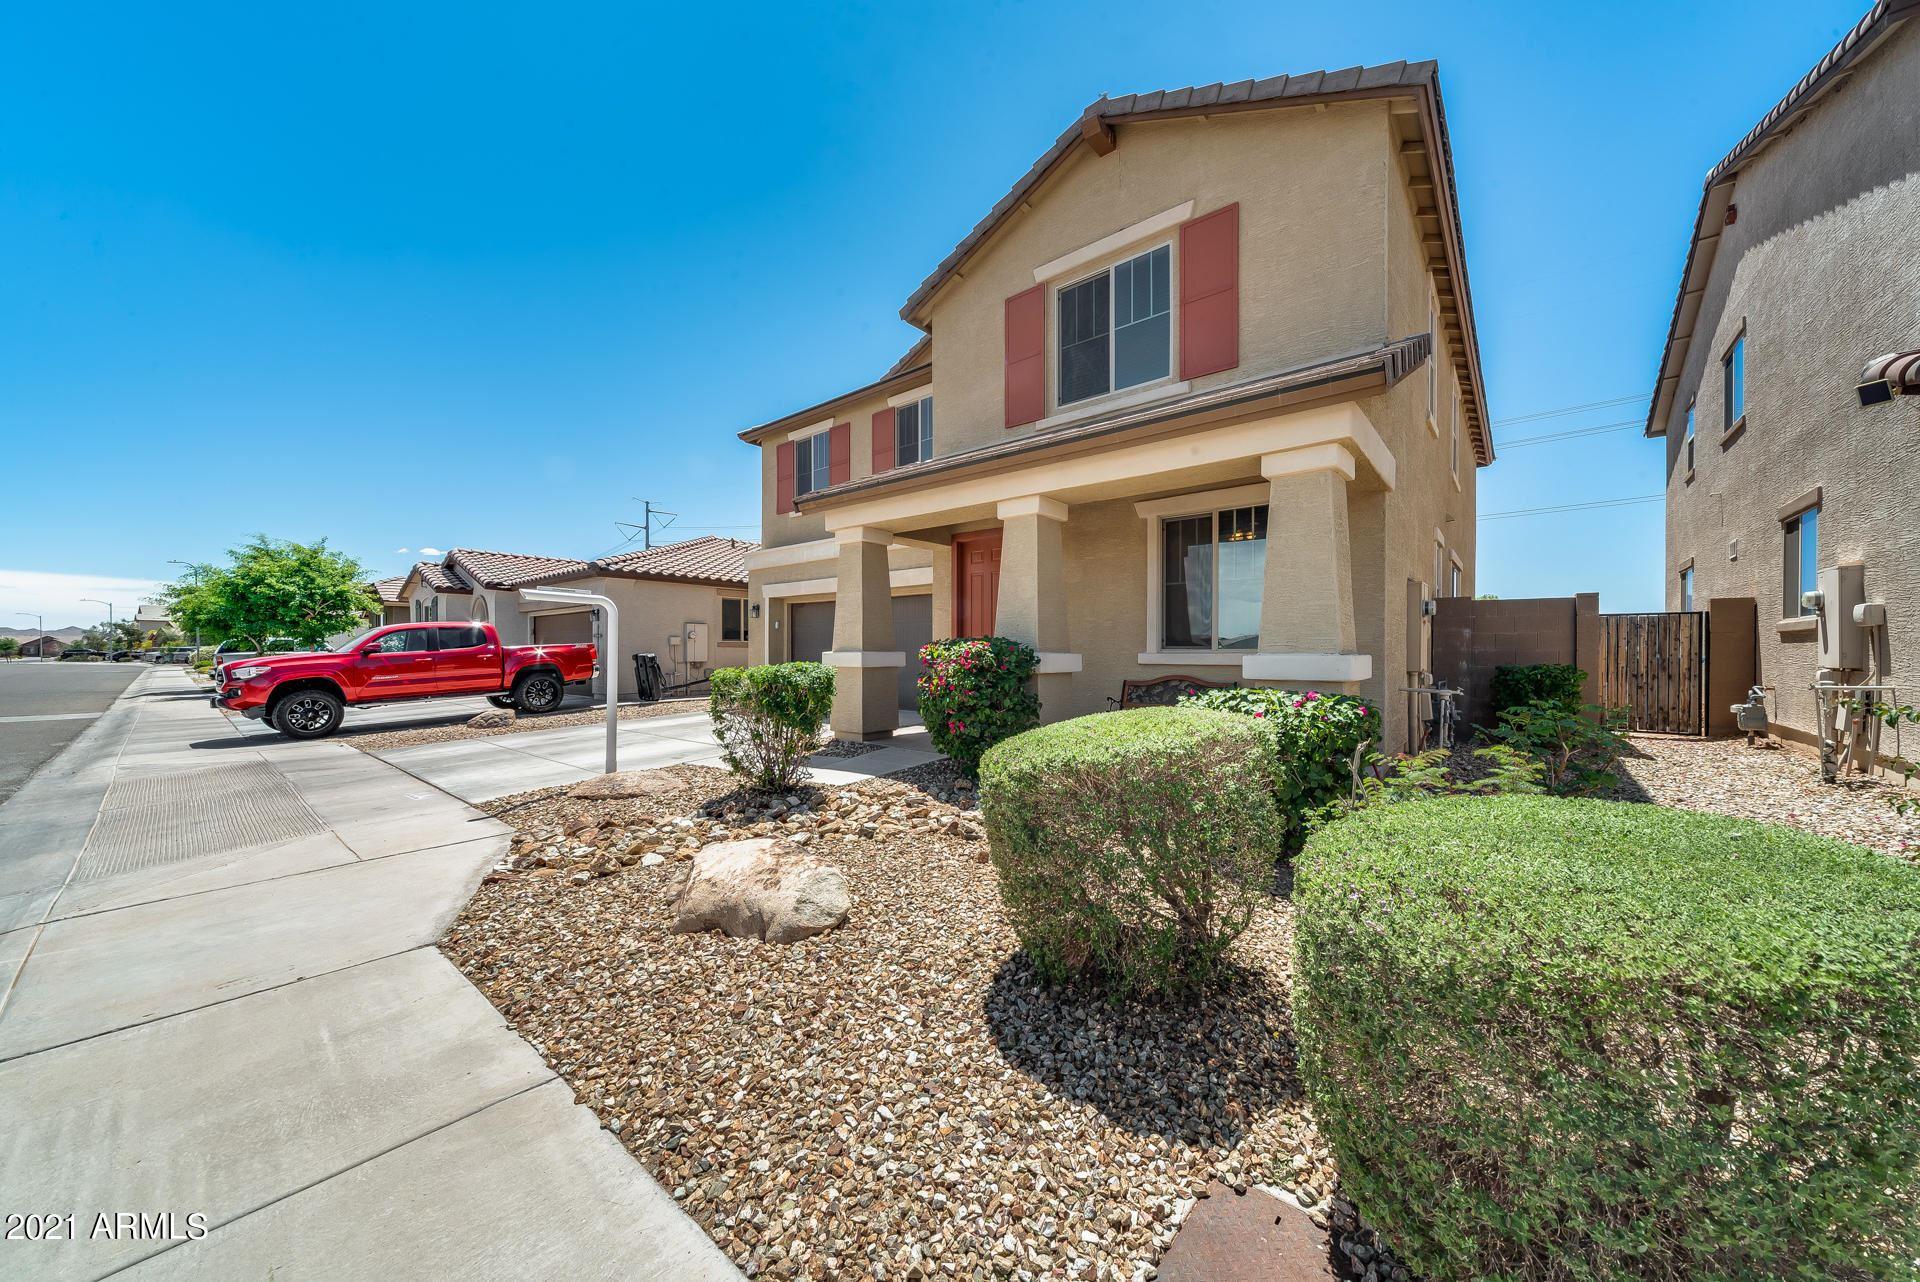 Photo of 6922 S 78TH Drive, Laveen, AZ 85339 (MLS # 6229385)